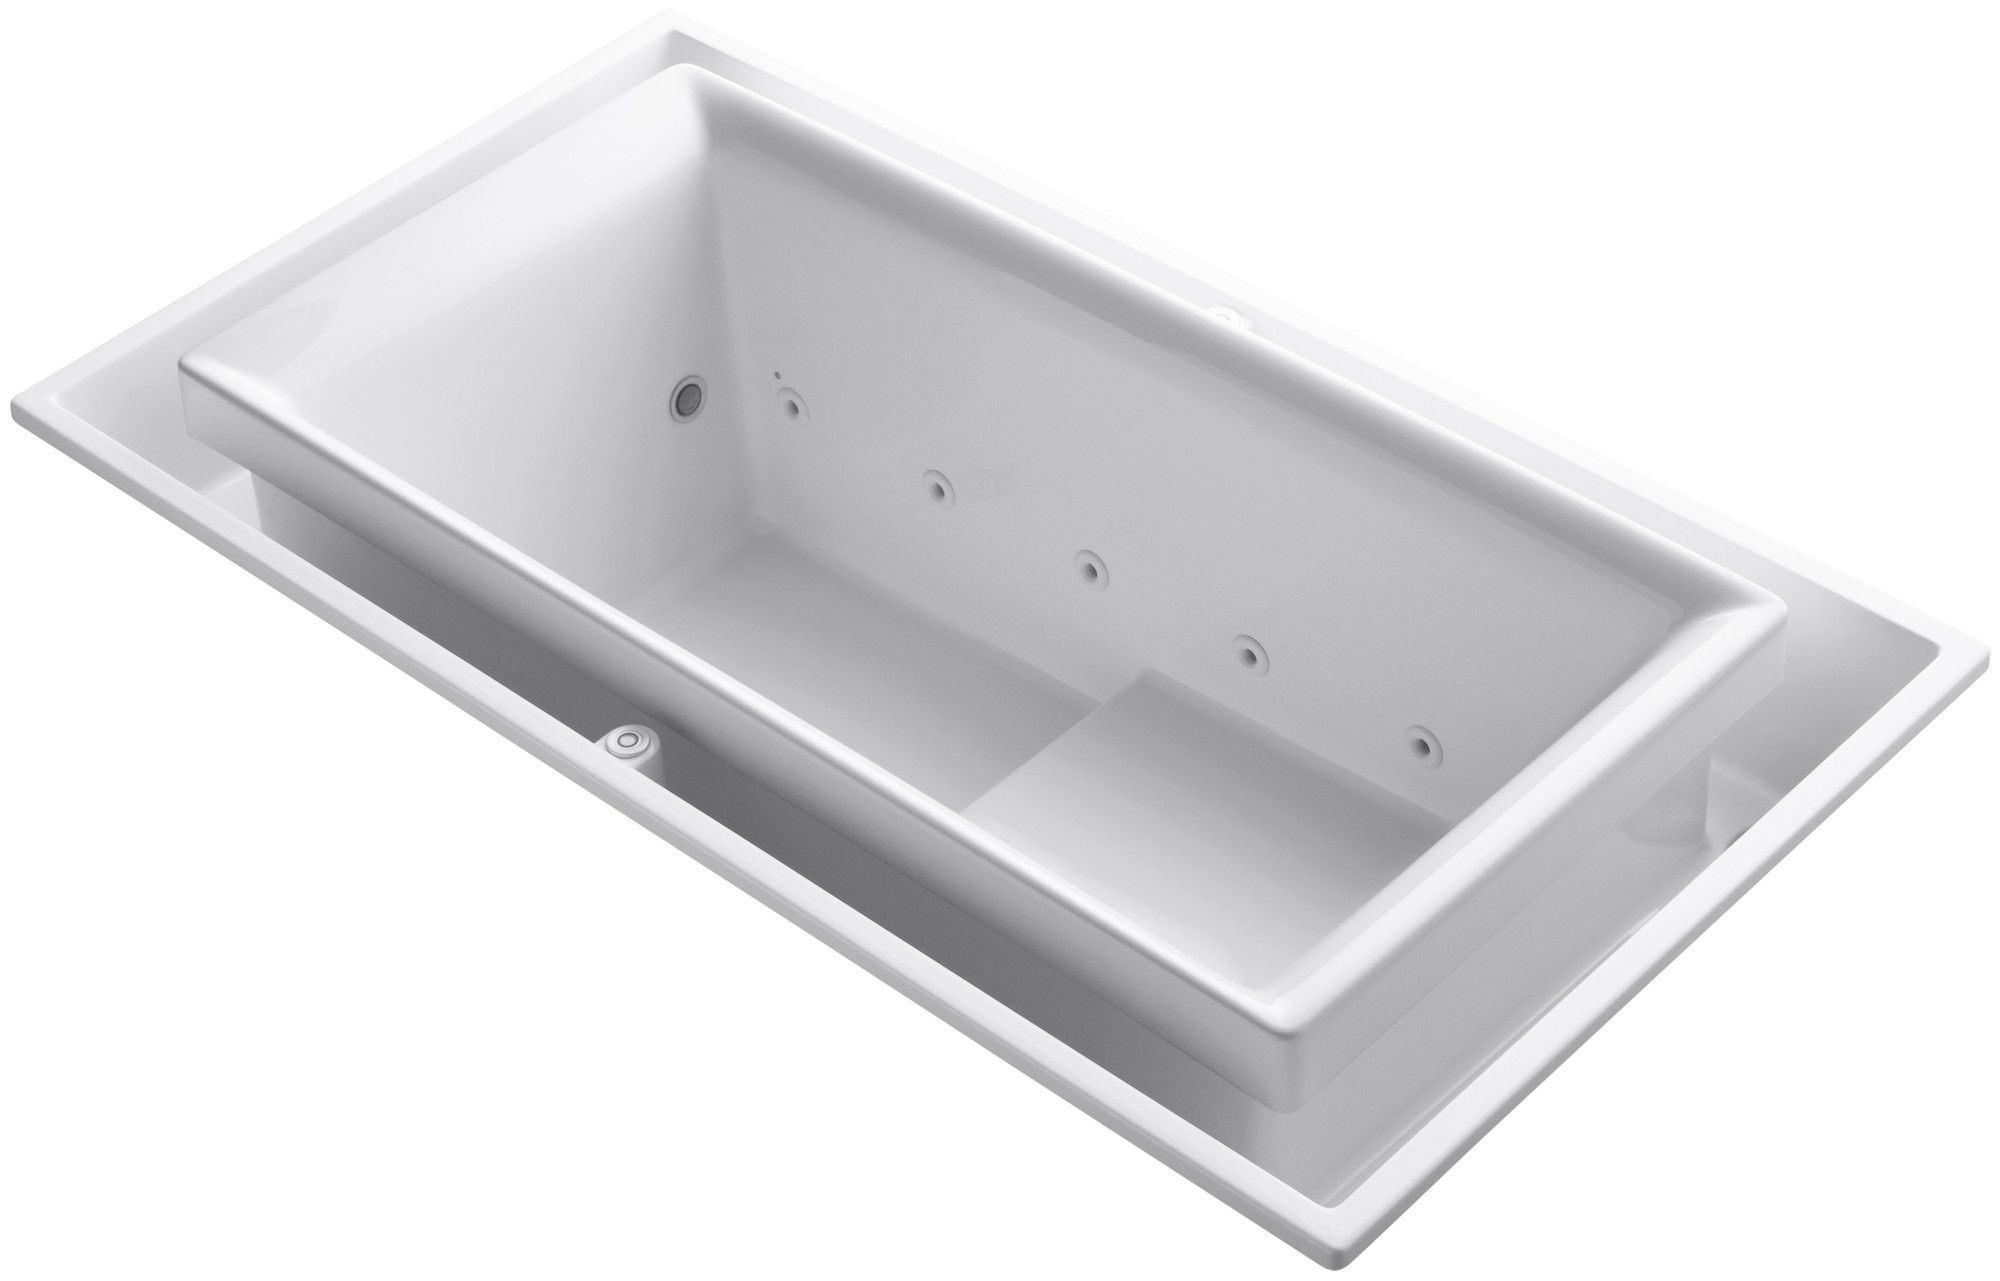 "Sok 75"" x 41"" Air / Whirlpool Bathtub"